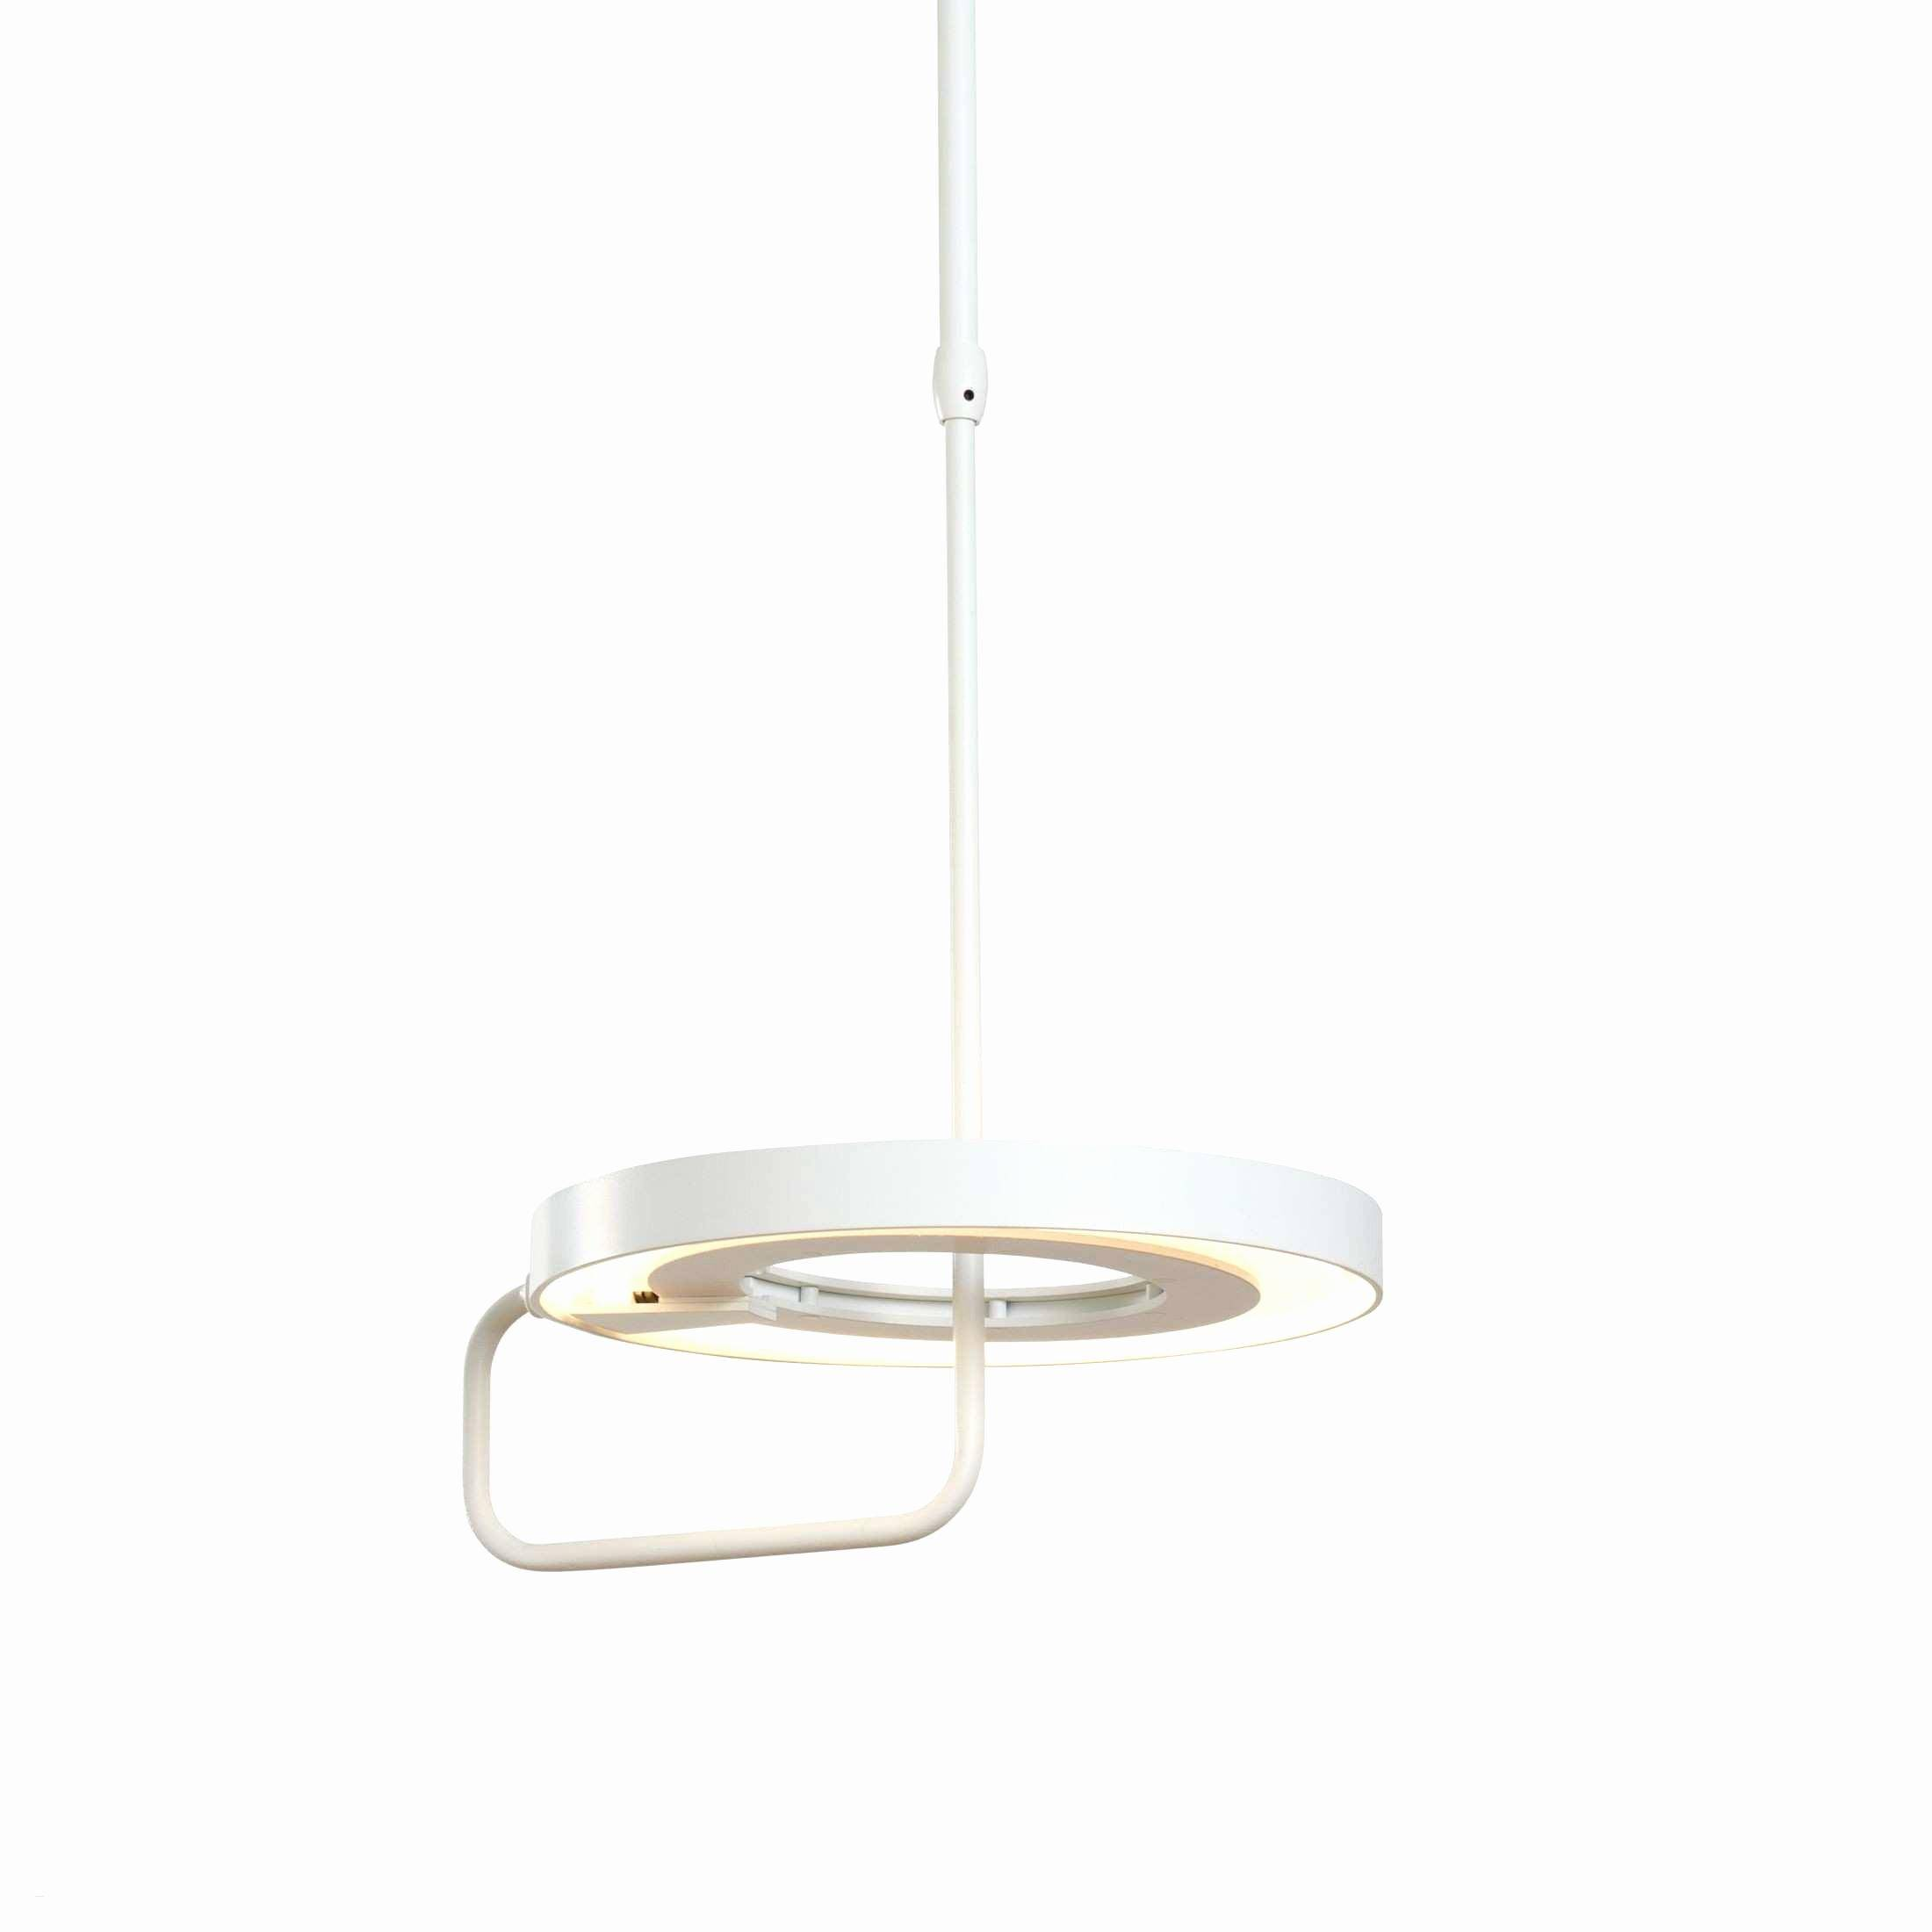 decorative pendant light fixtures inspirational decorative dining room ceiling lights within outdoor ceiling lights of decorative pendant light fixtures